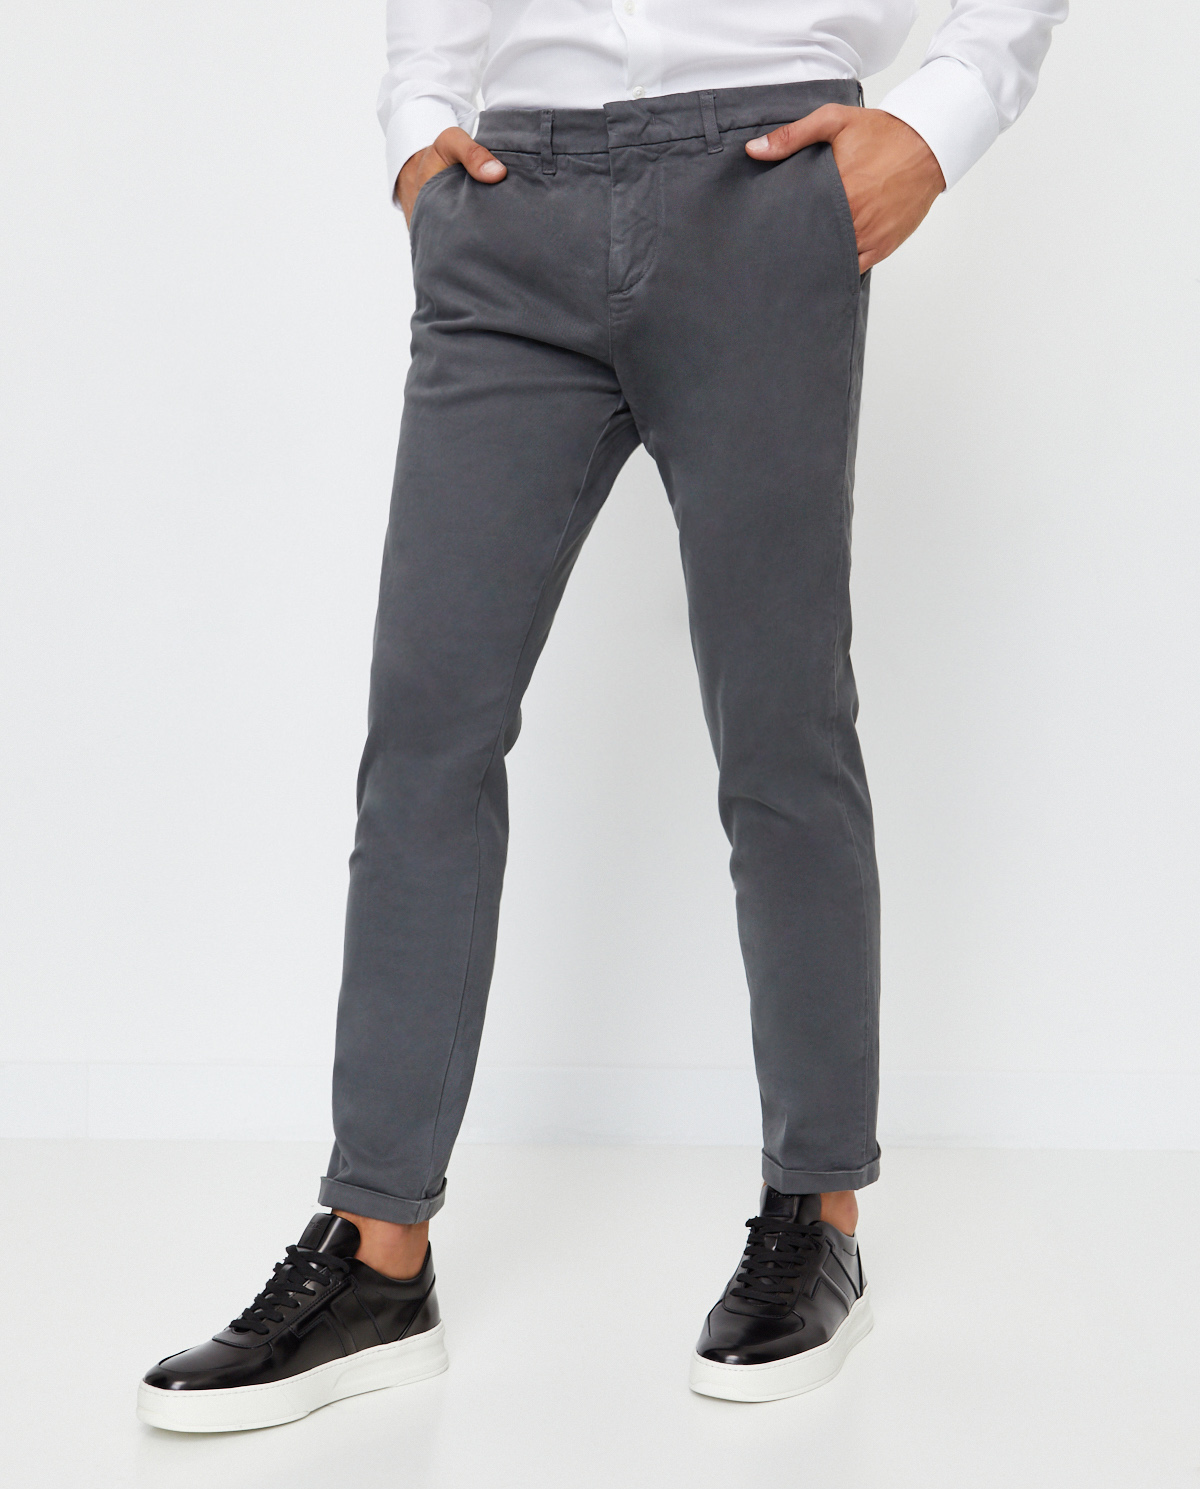 Męskie szare spodnie chino Fay NTM8641187TQGGB406